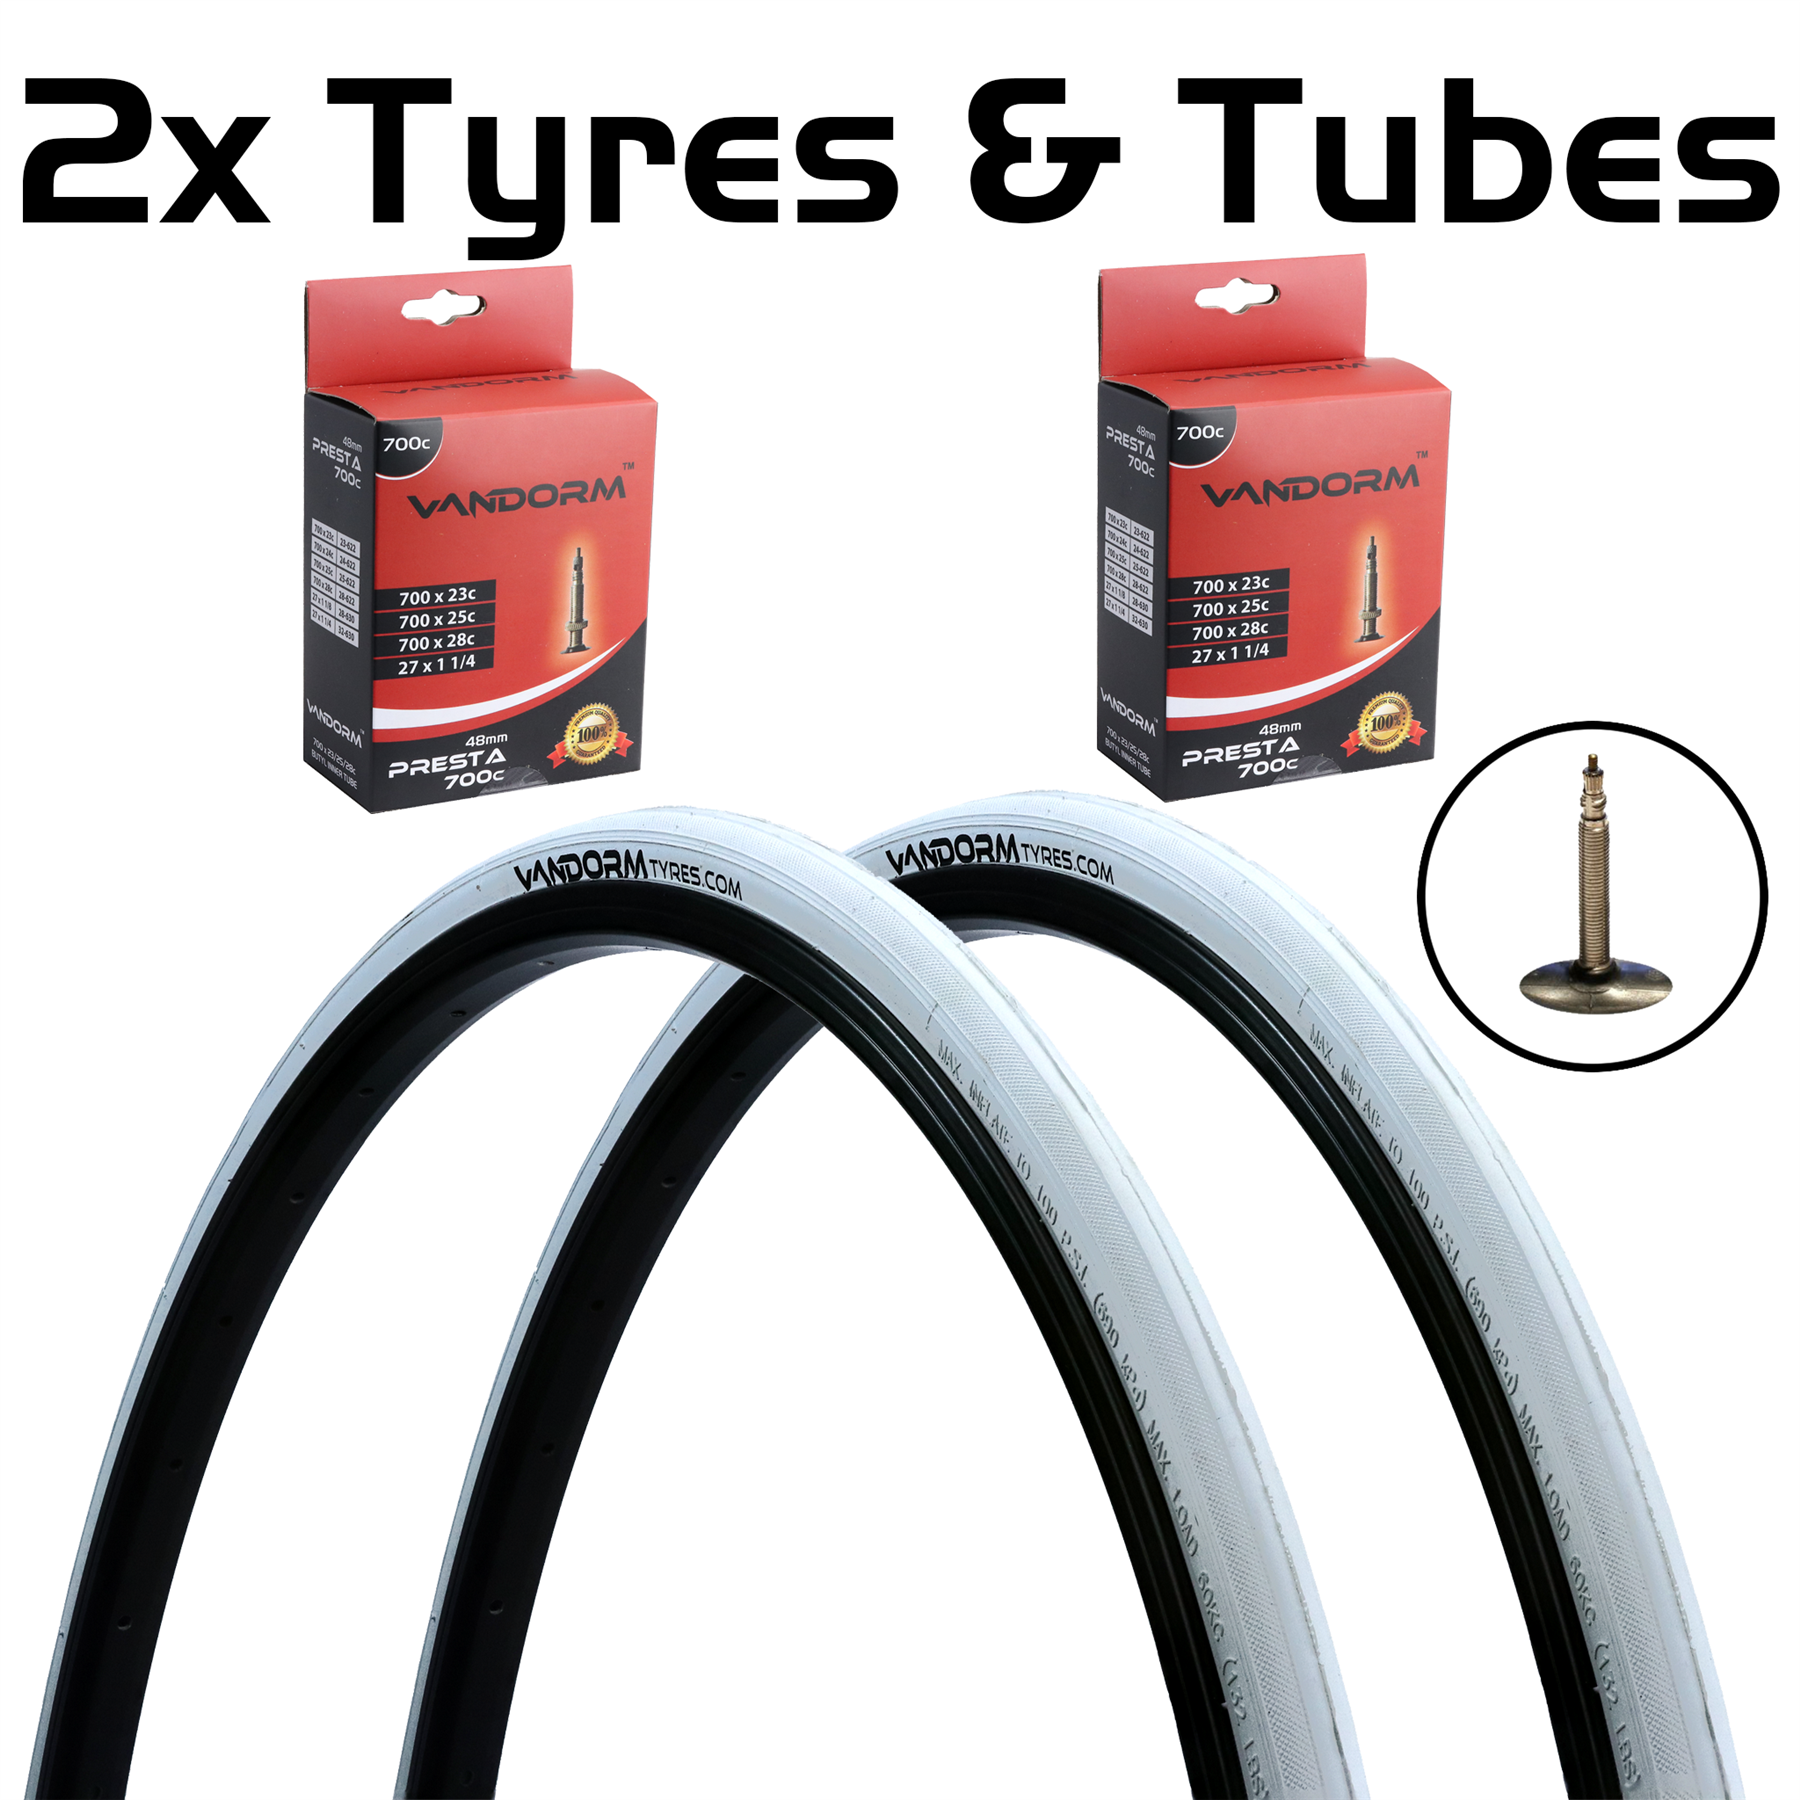 miniatuur 13 - Vandorm 700 x 23c SPEED 3 Colour Road Bike Fixie Tyres & Tube DEAL OPTIONS